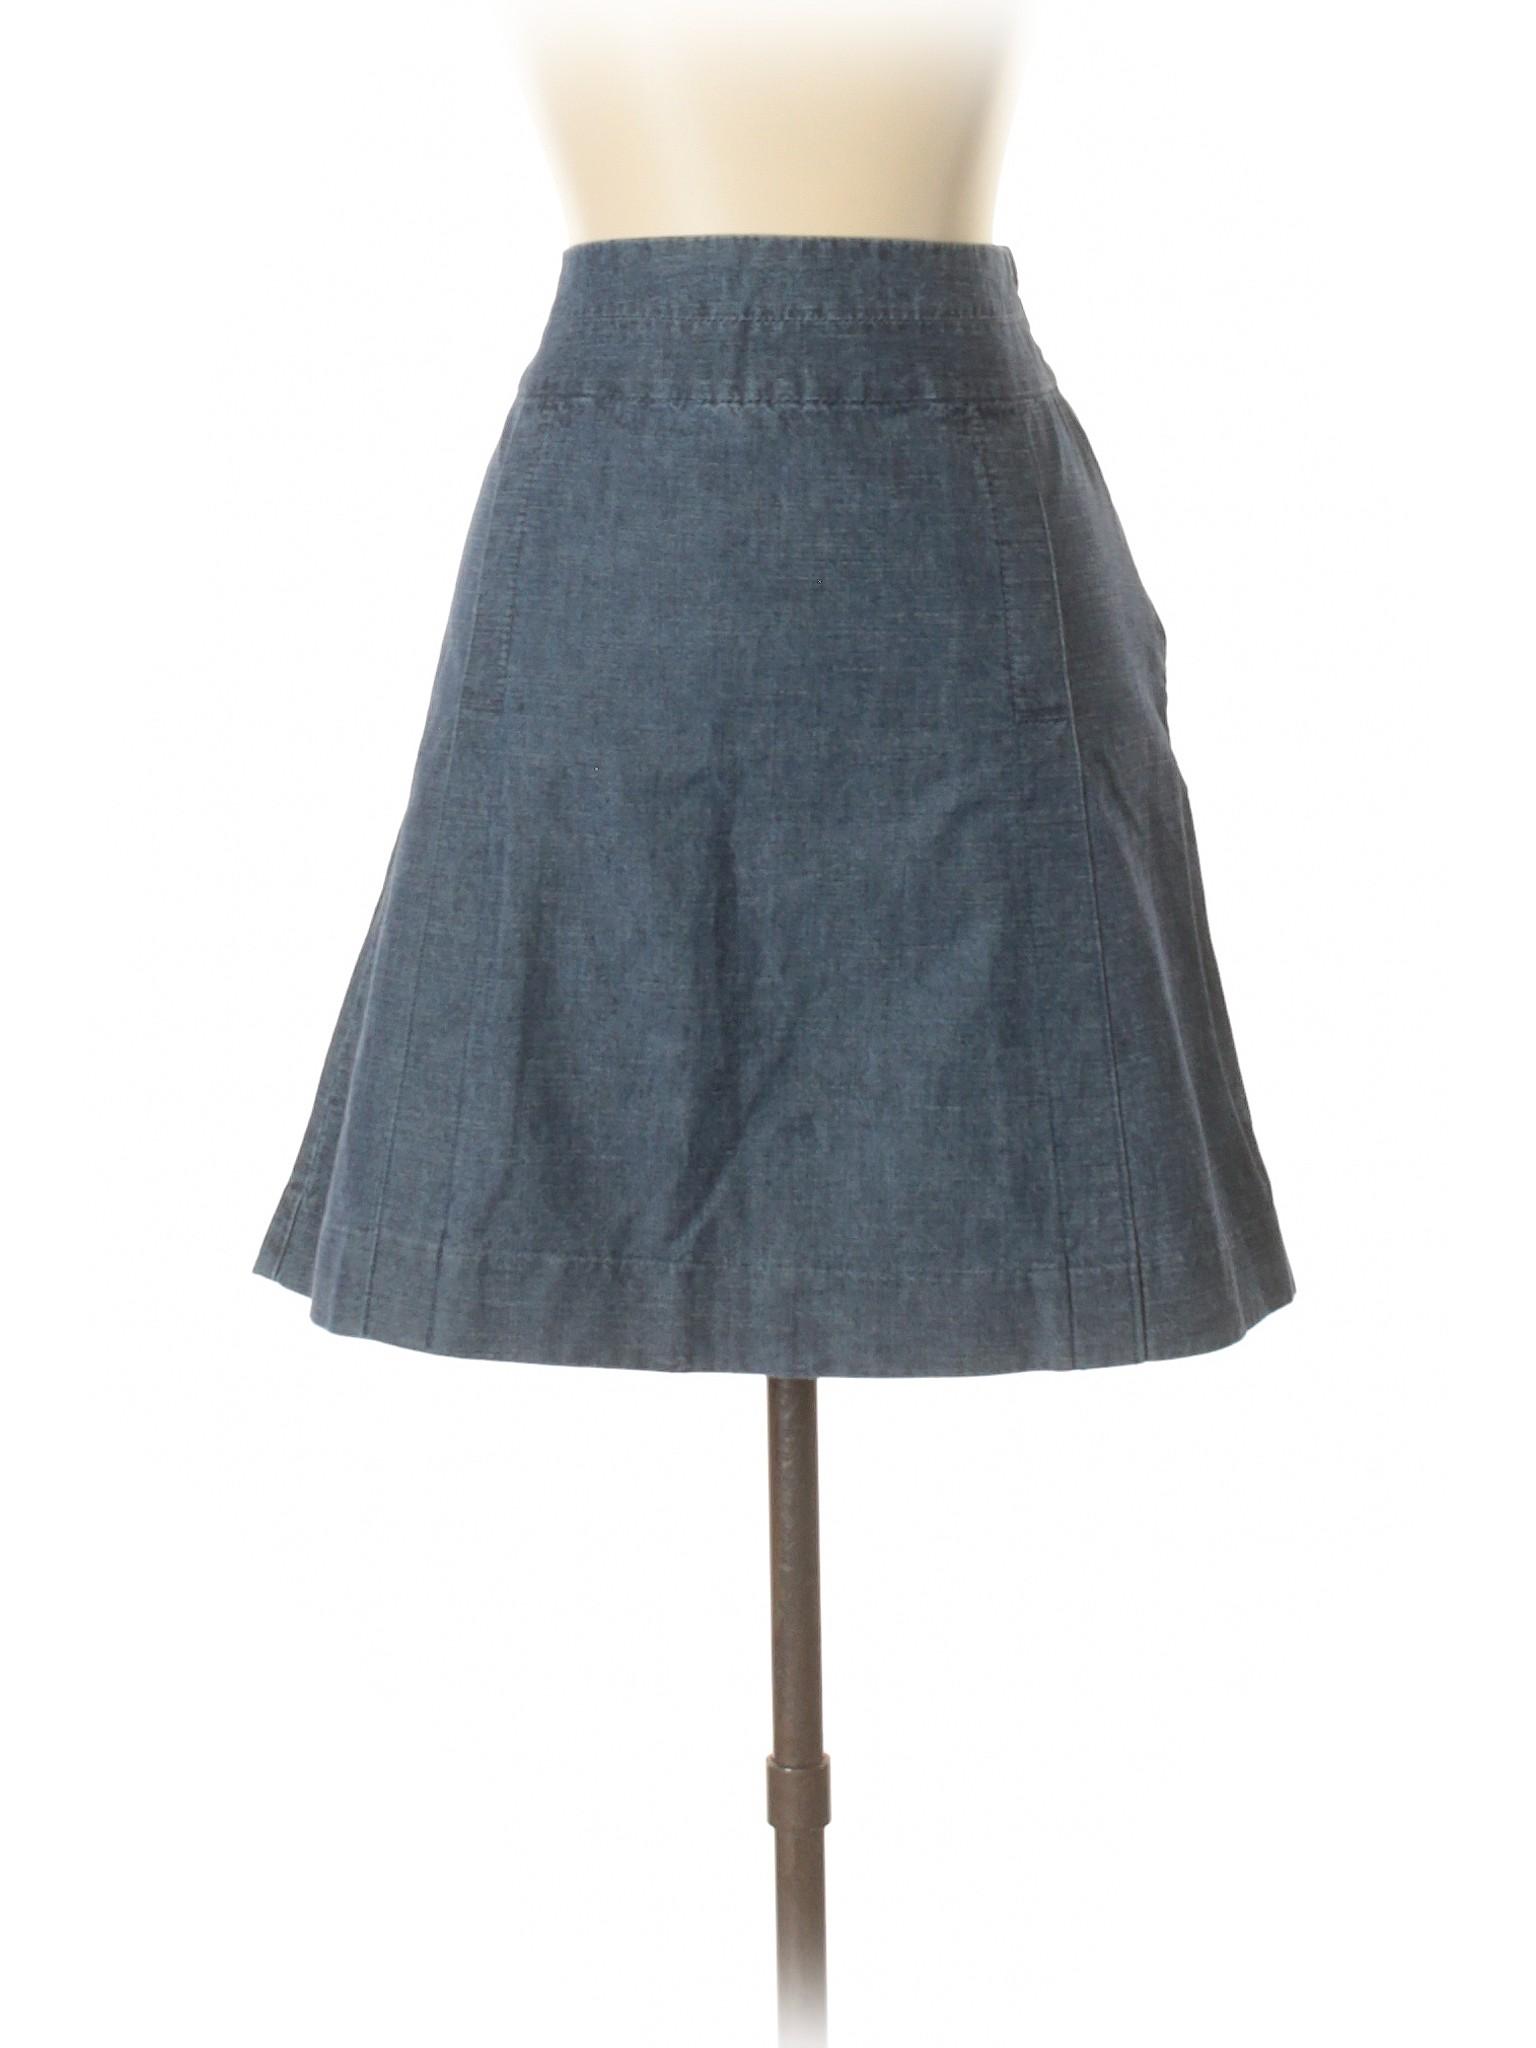 Boutique Skirt Denim Skirt Boutique Boutique Denim Denim Skirt Fr4g5Fn1W